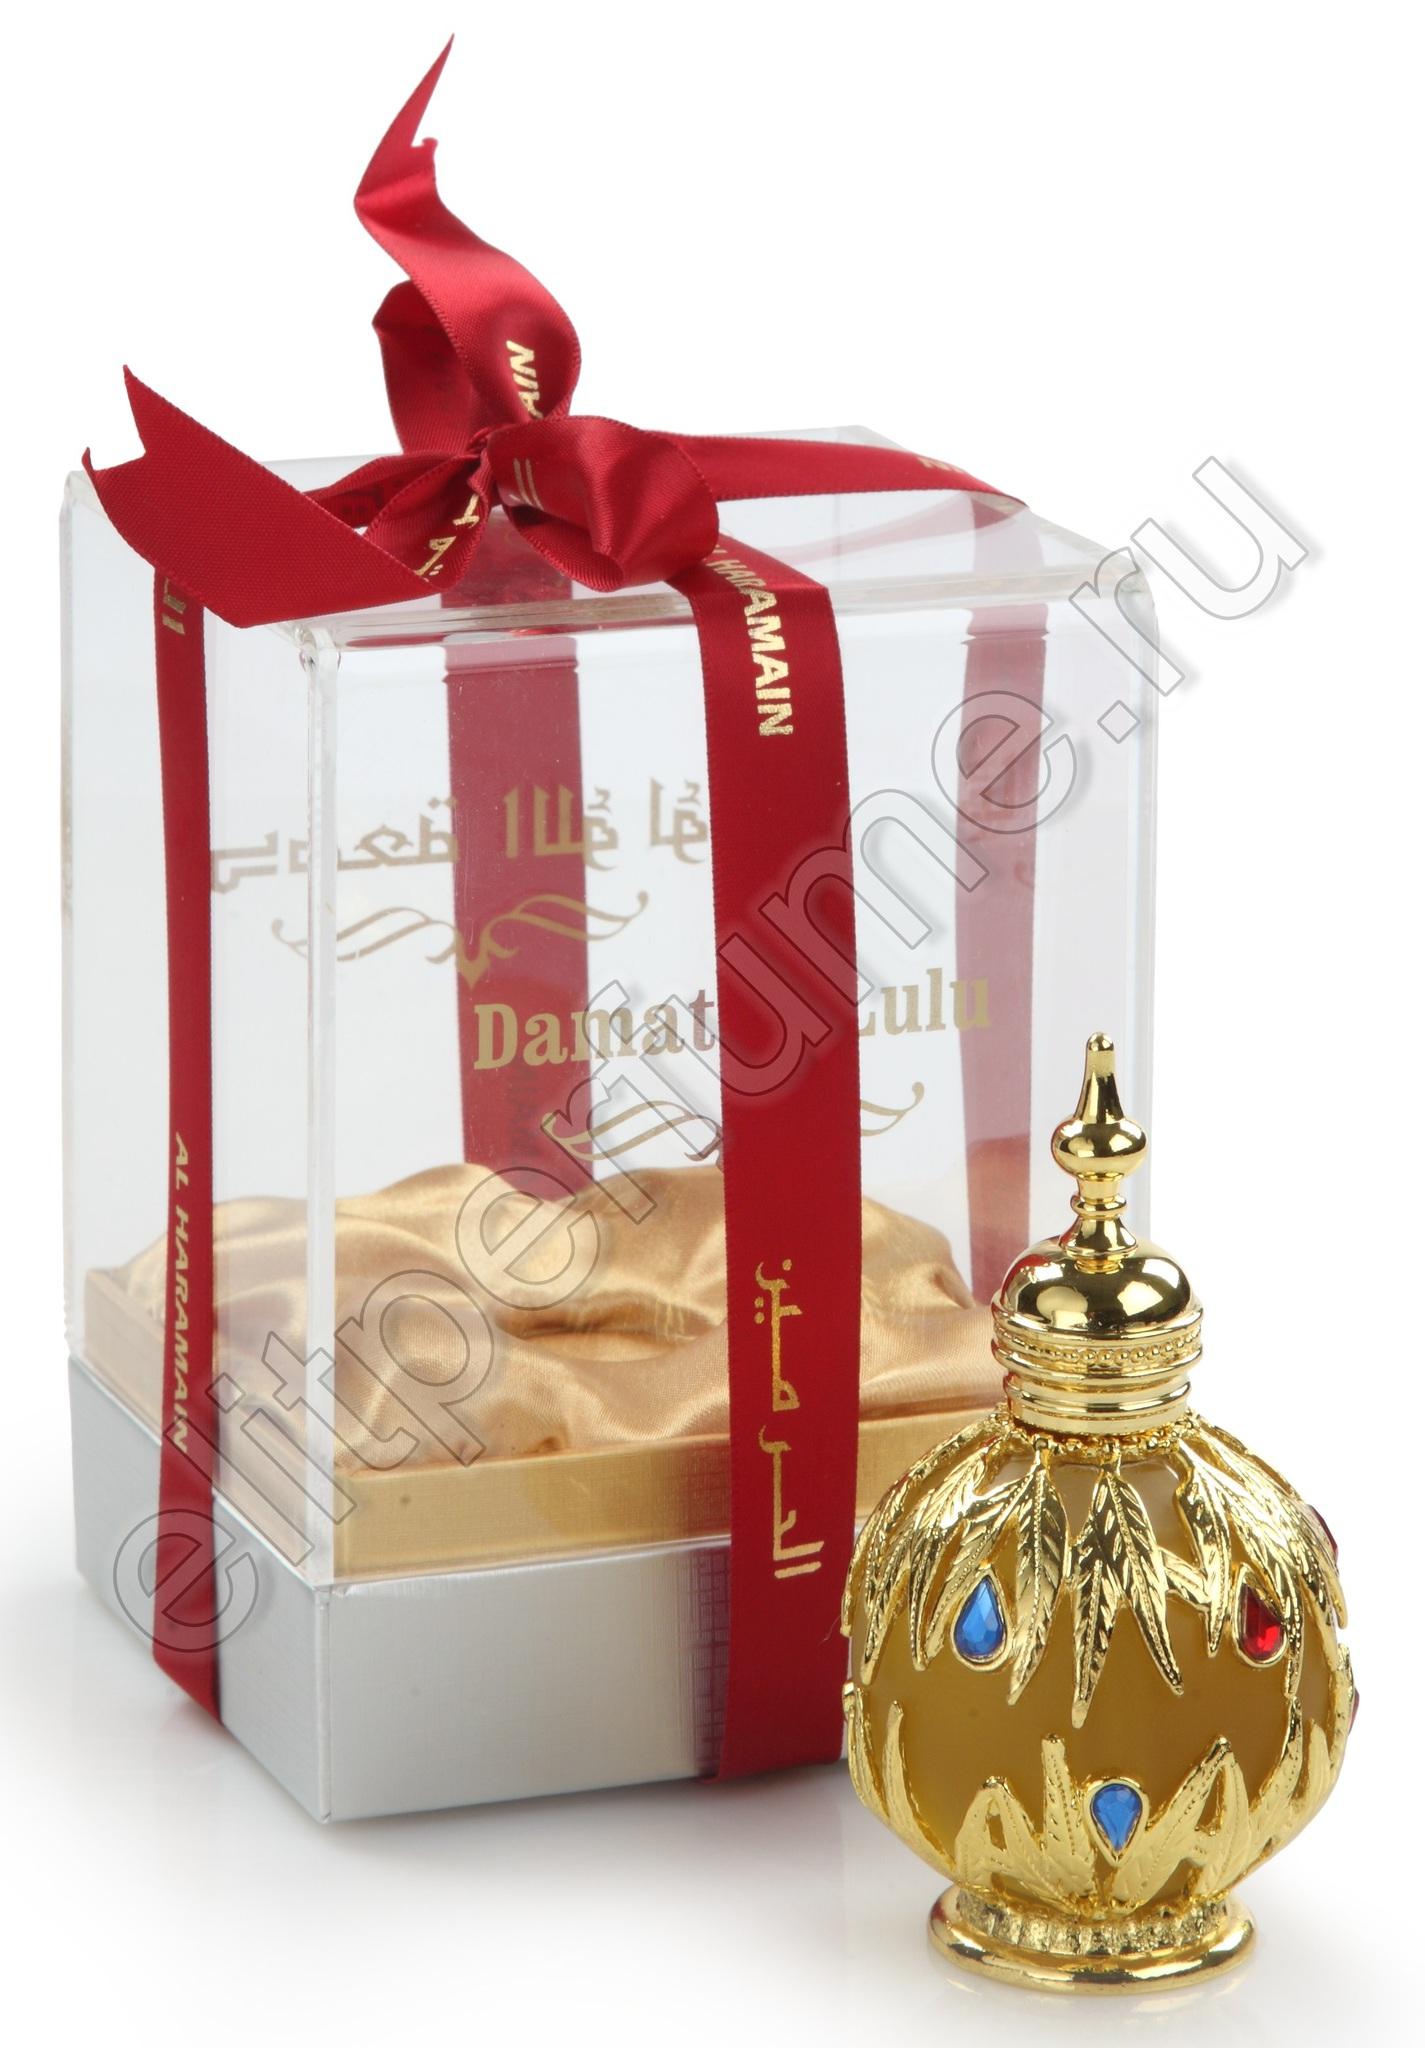 Дамат Аль-Лулу Damat Al Lulu 40 мл арабские масляные духи от Аль Харамайн Al Haramain Perfumes